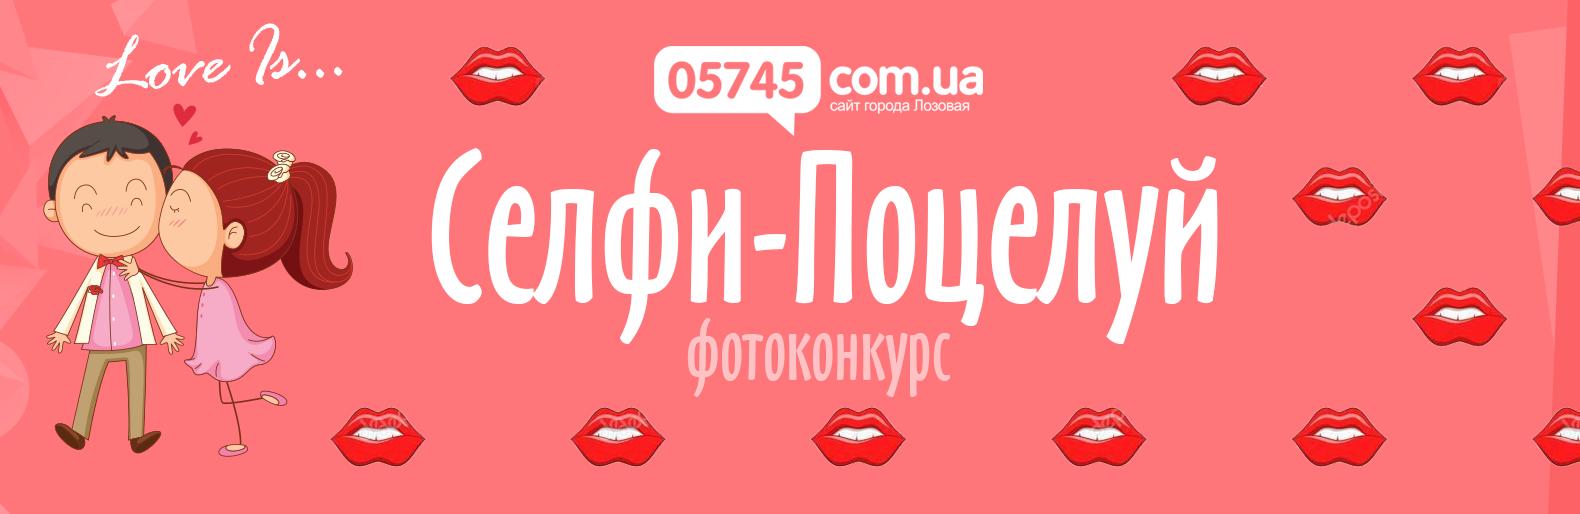 Фотоконкурс «Селфи -Поцелуй»